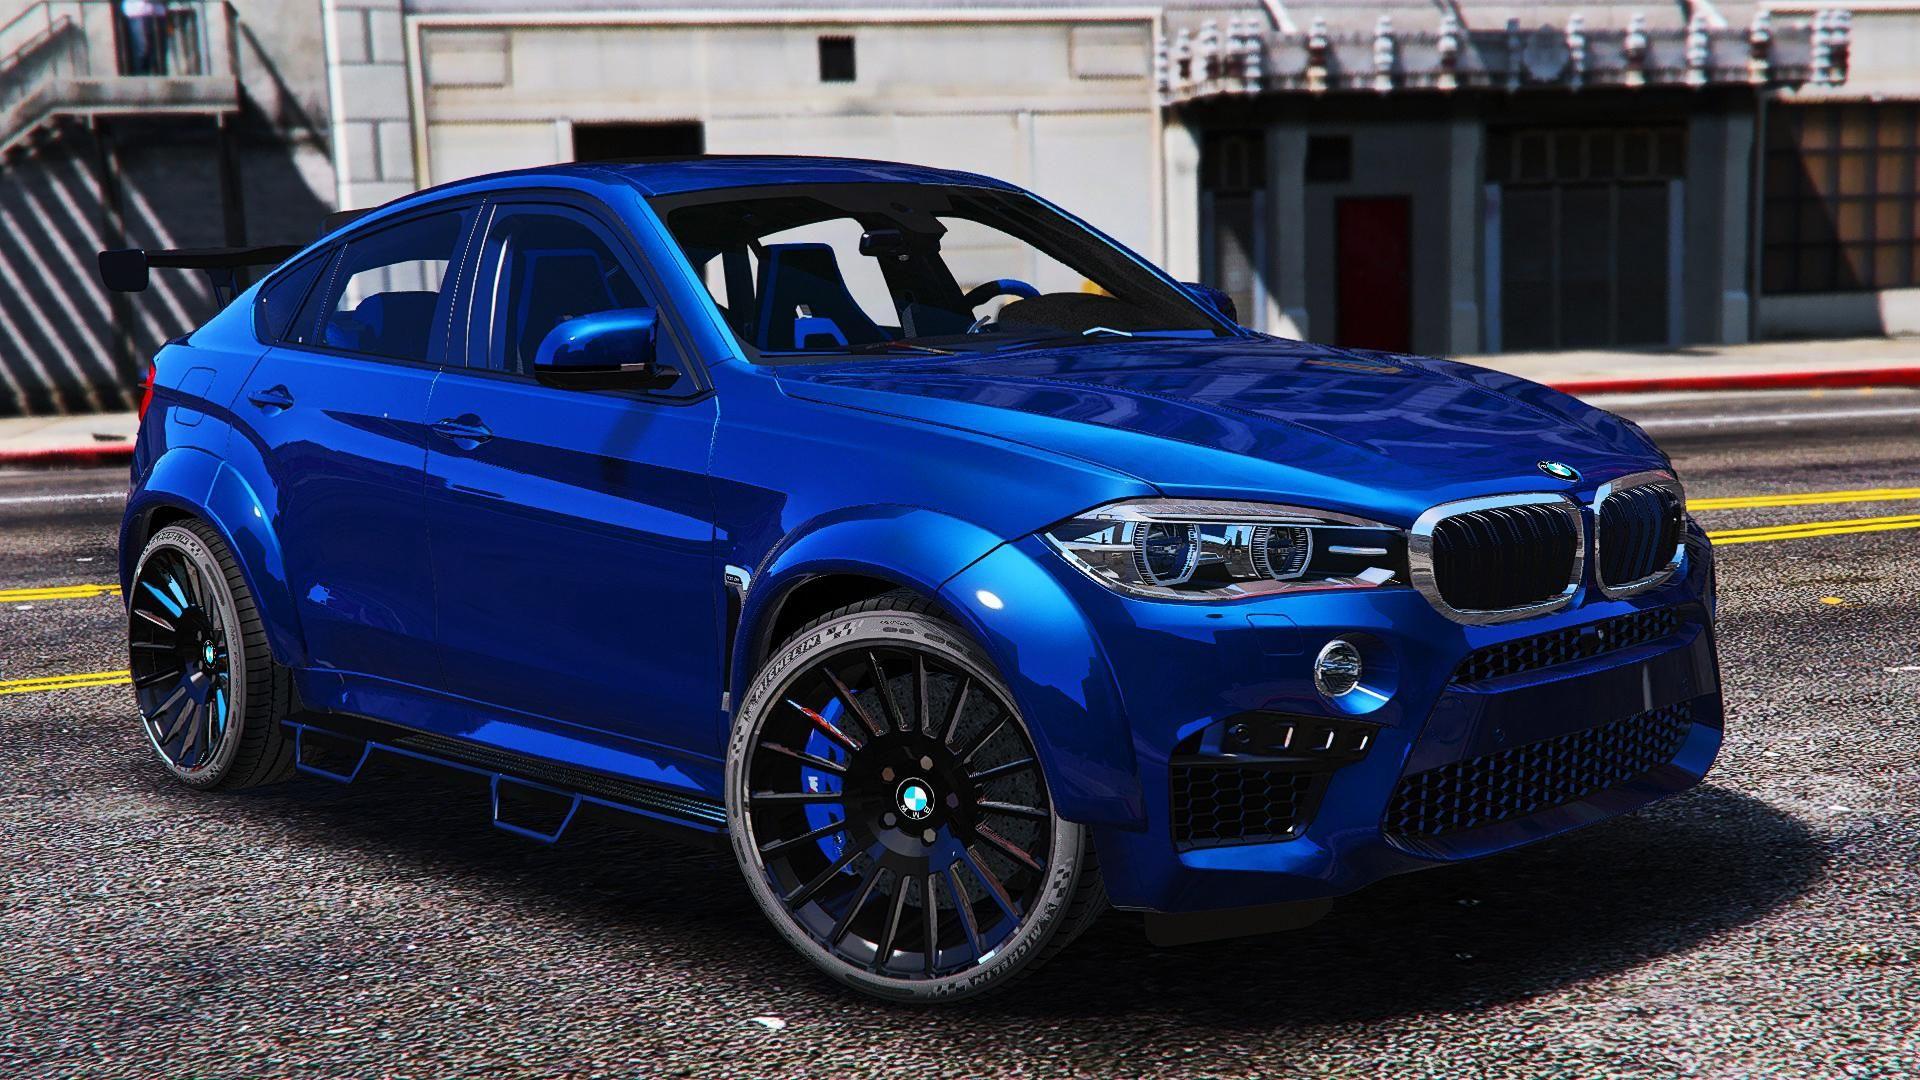 Custom Bmw X6m F16 Breitbau Features All Regular Car Functionshq Interiorhq Exterior3d Engineus Plate 3d Suspensioncustom Handli Bmw Blue Best Luxury Cars Bmw